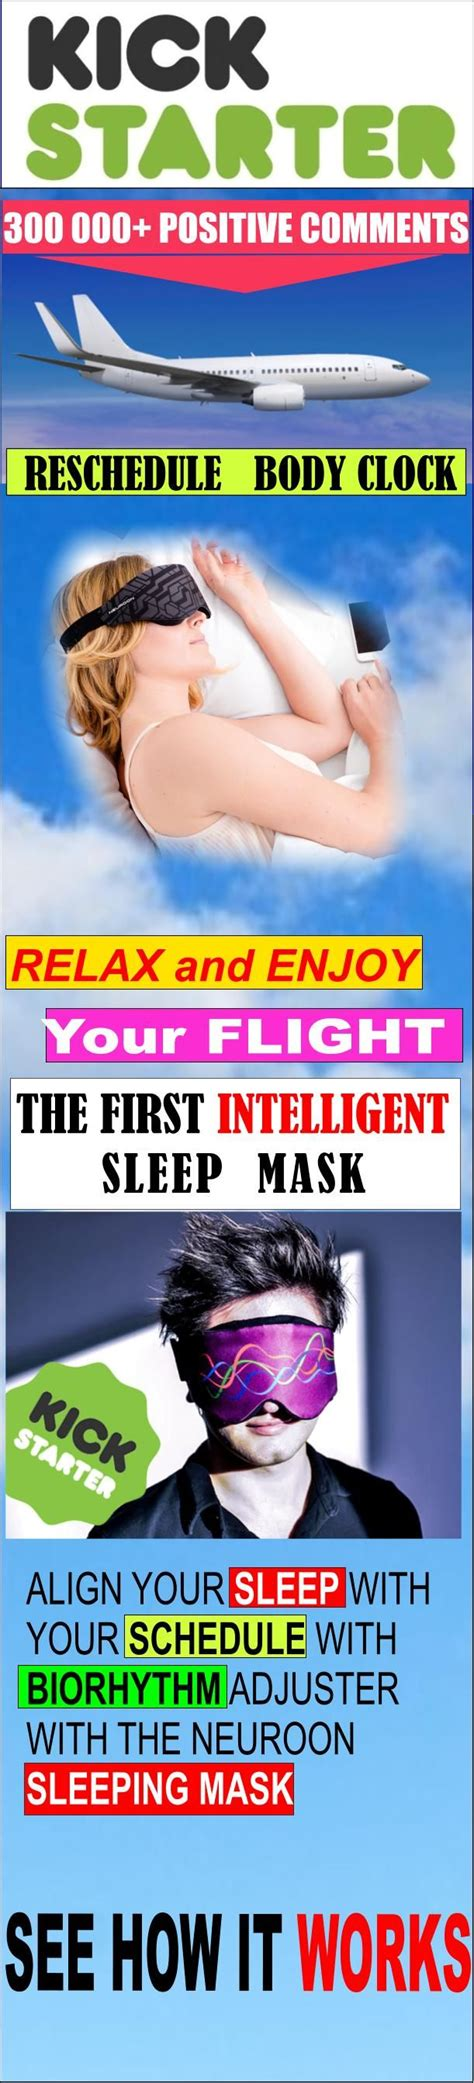 Clock Setelan Maldives 2 286 best images about maldives vacation on how to sleep eye masks and sleep